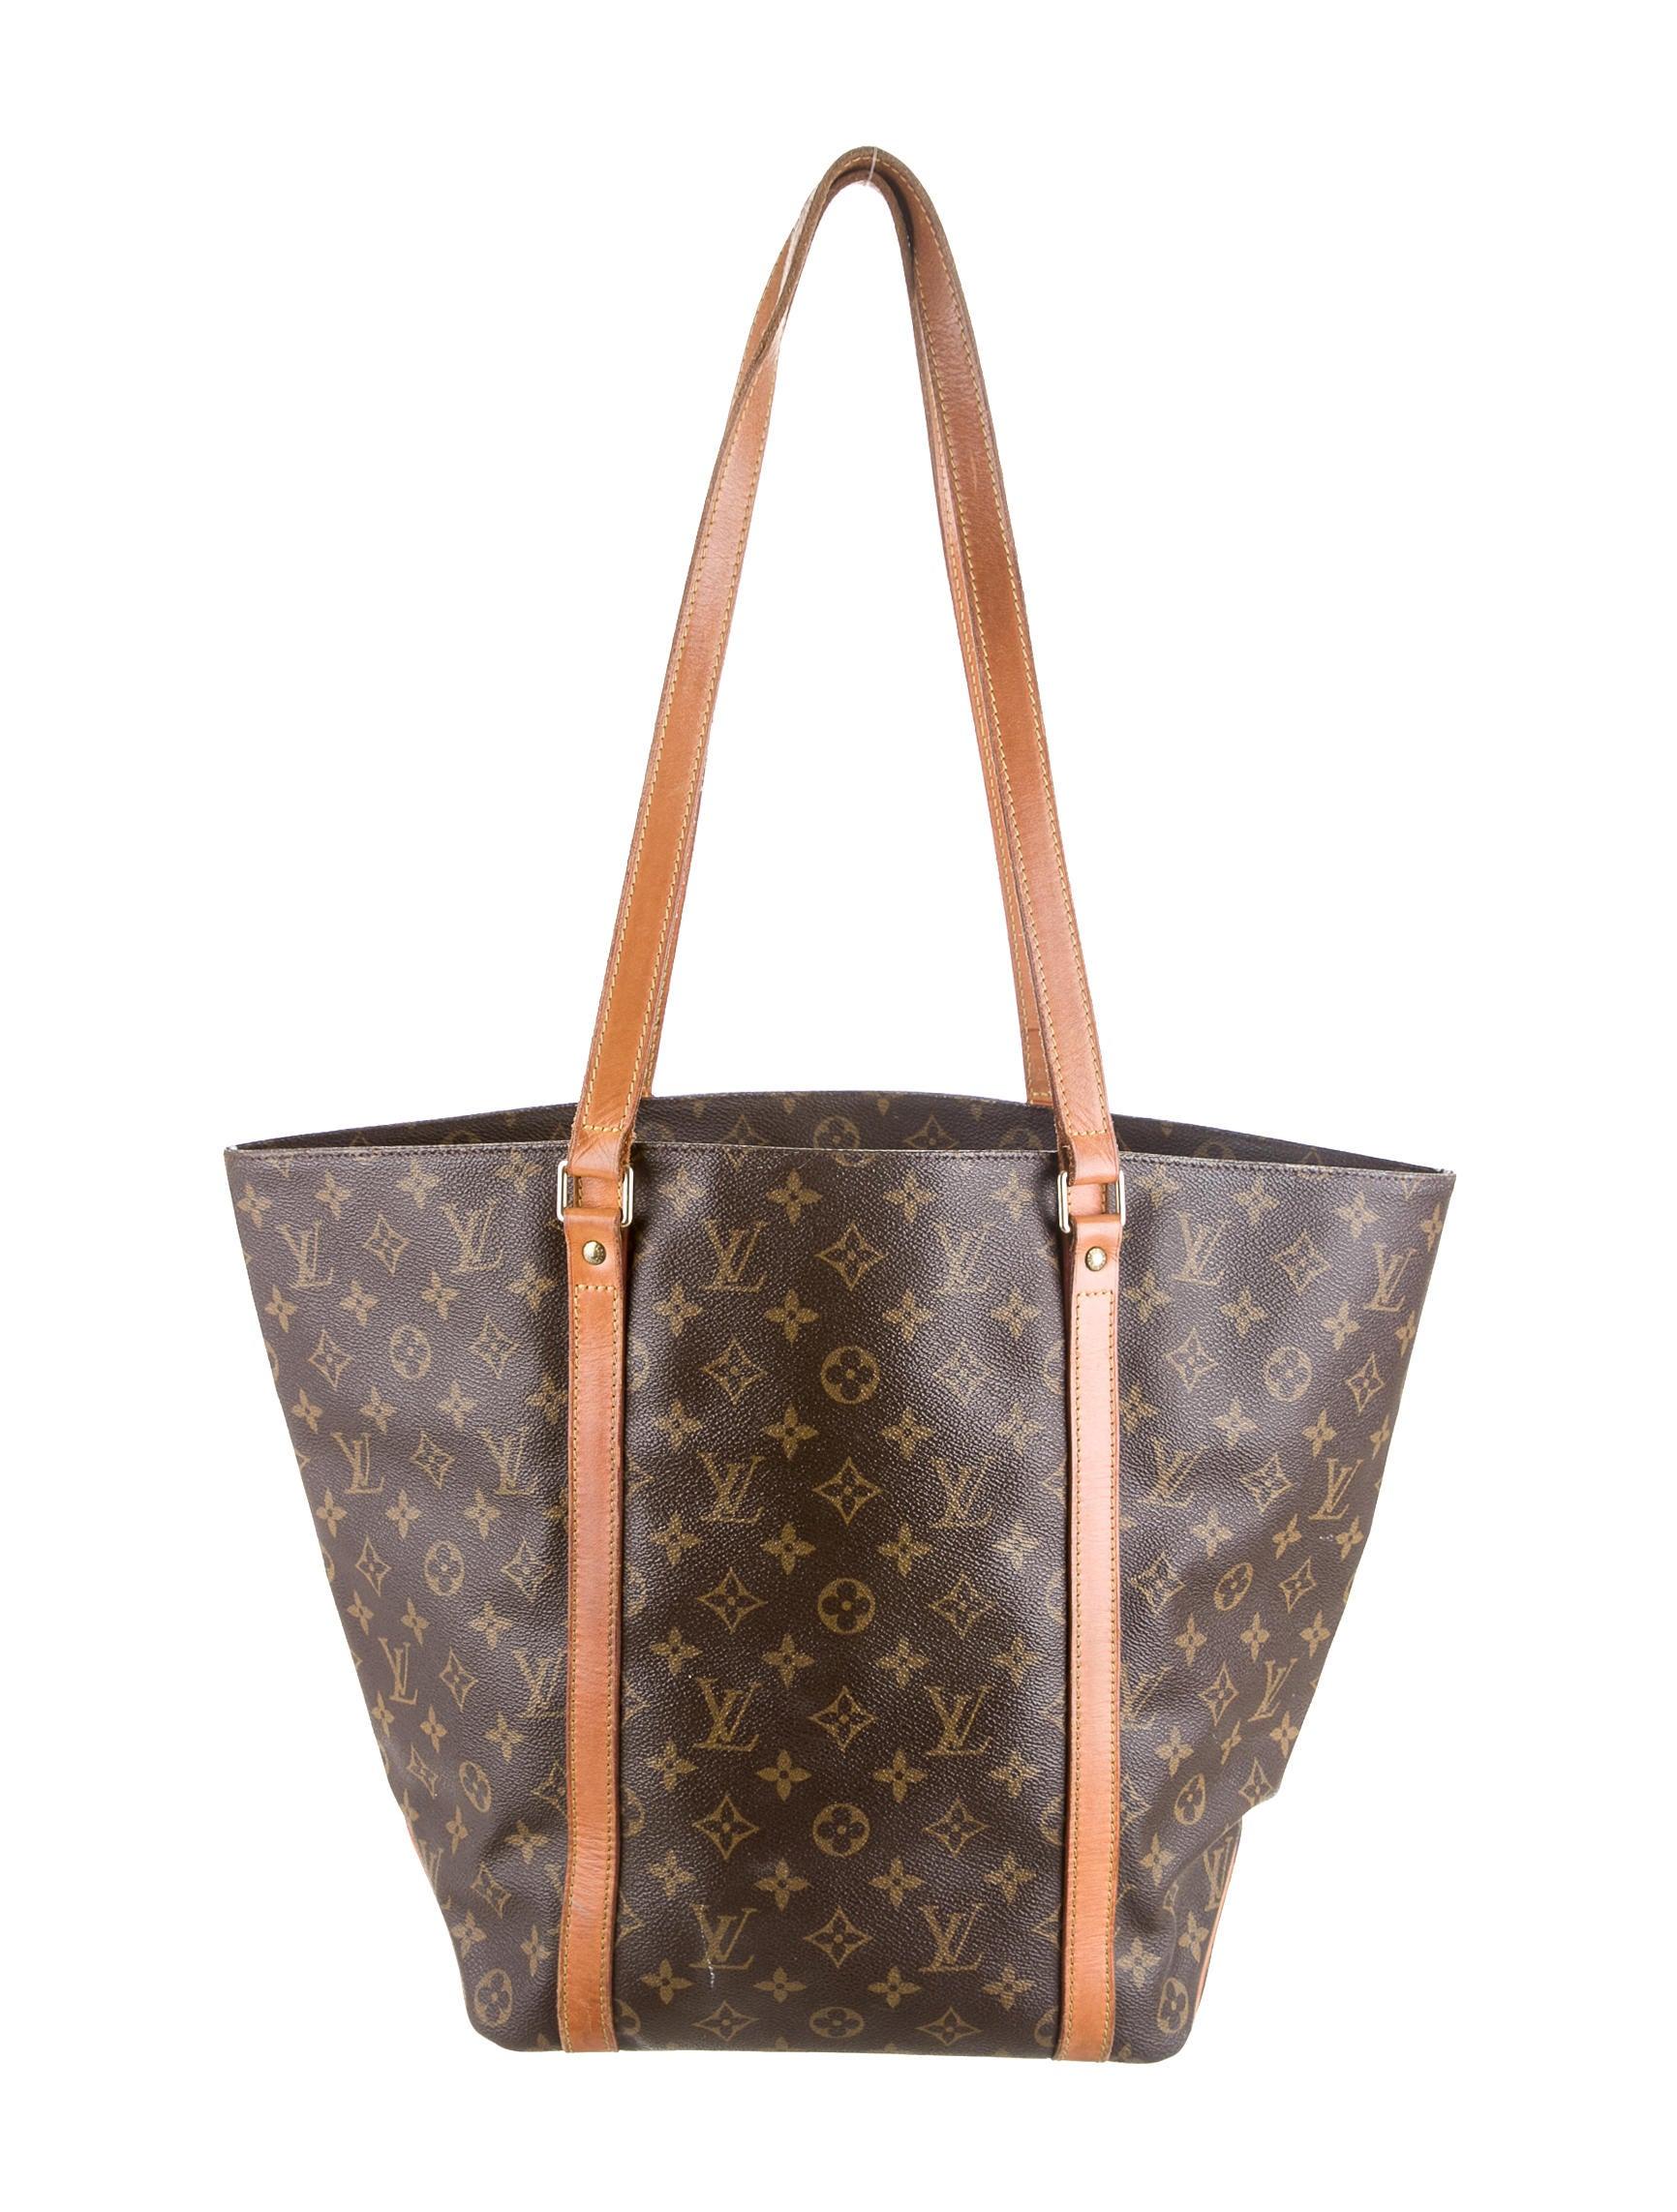 louis vuitton sac shopping tote handbags lou37948. Black Bedroom Furniture Sets. Home Design Ideas